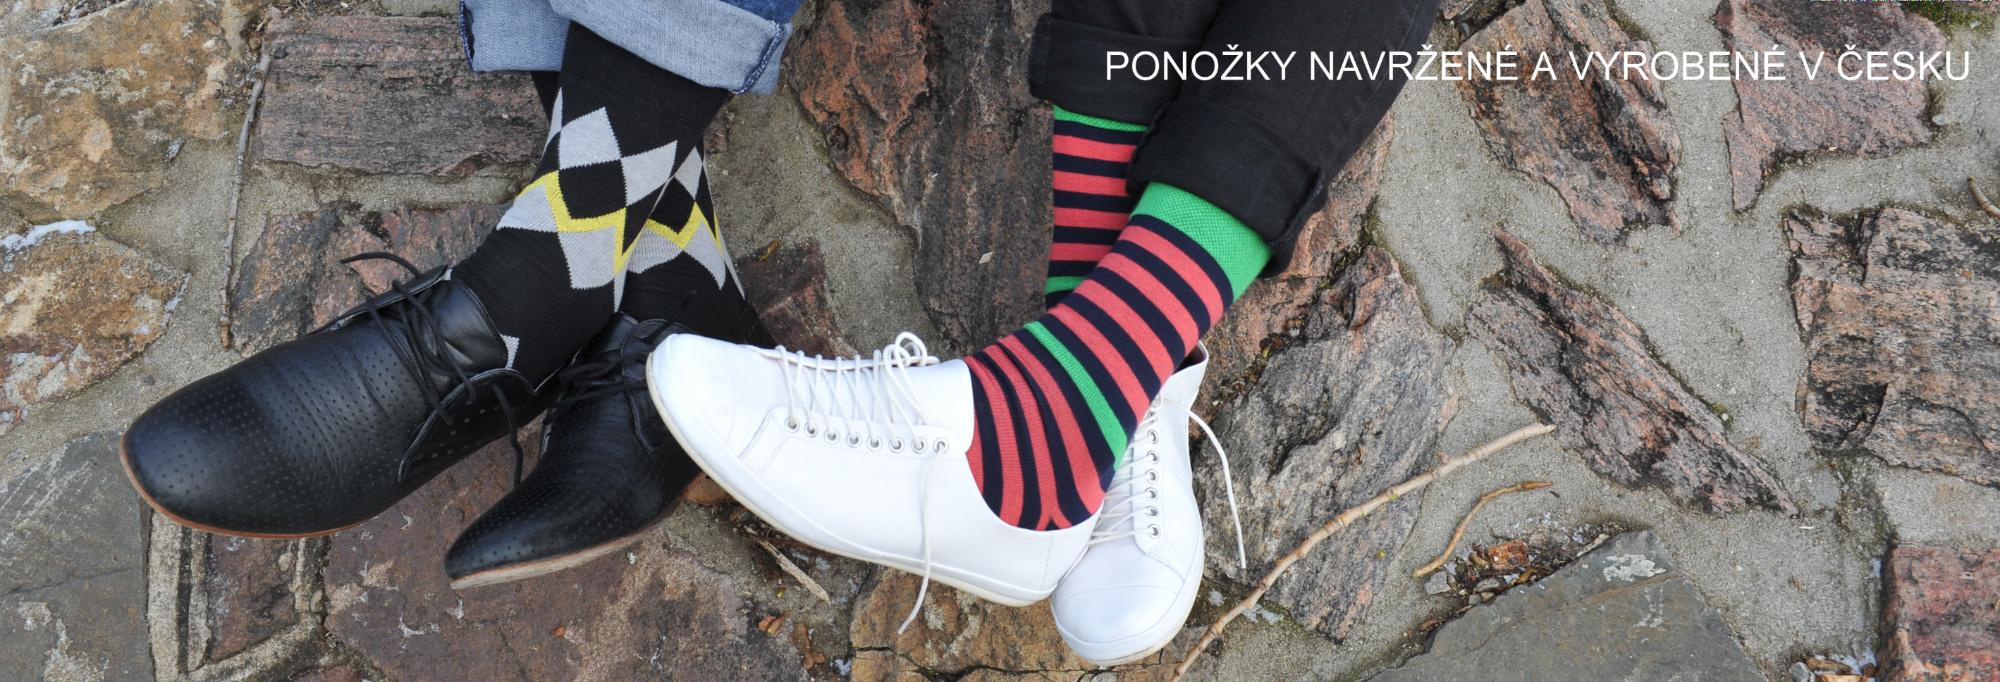 Ponožky navržené a vyrobené v Česku